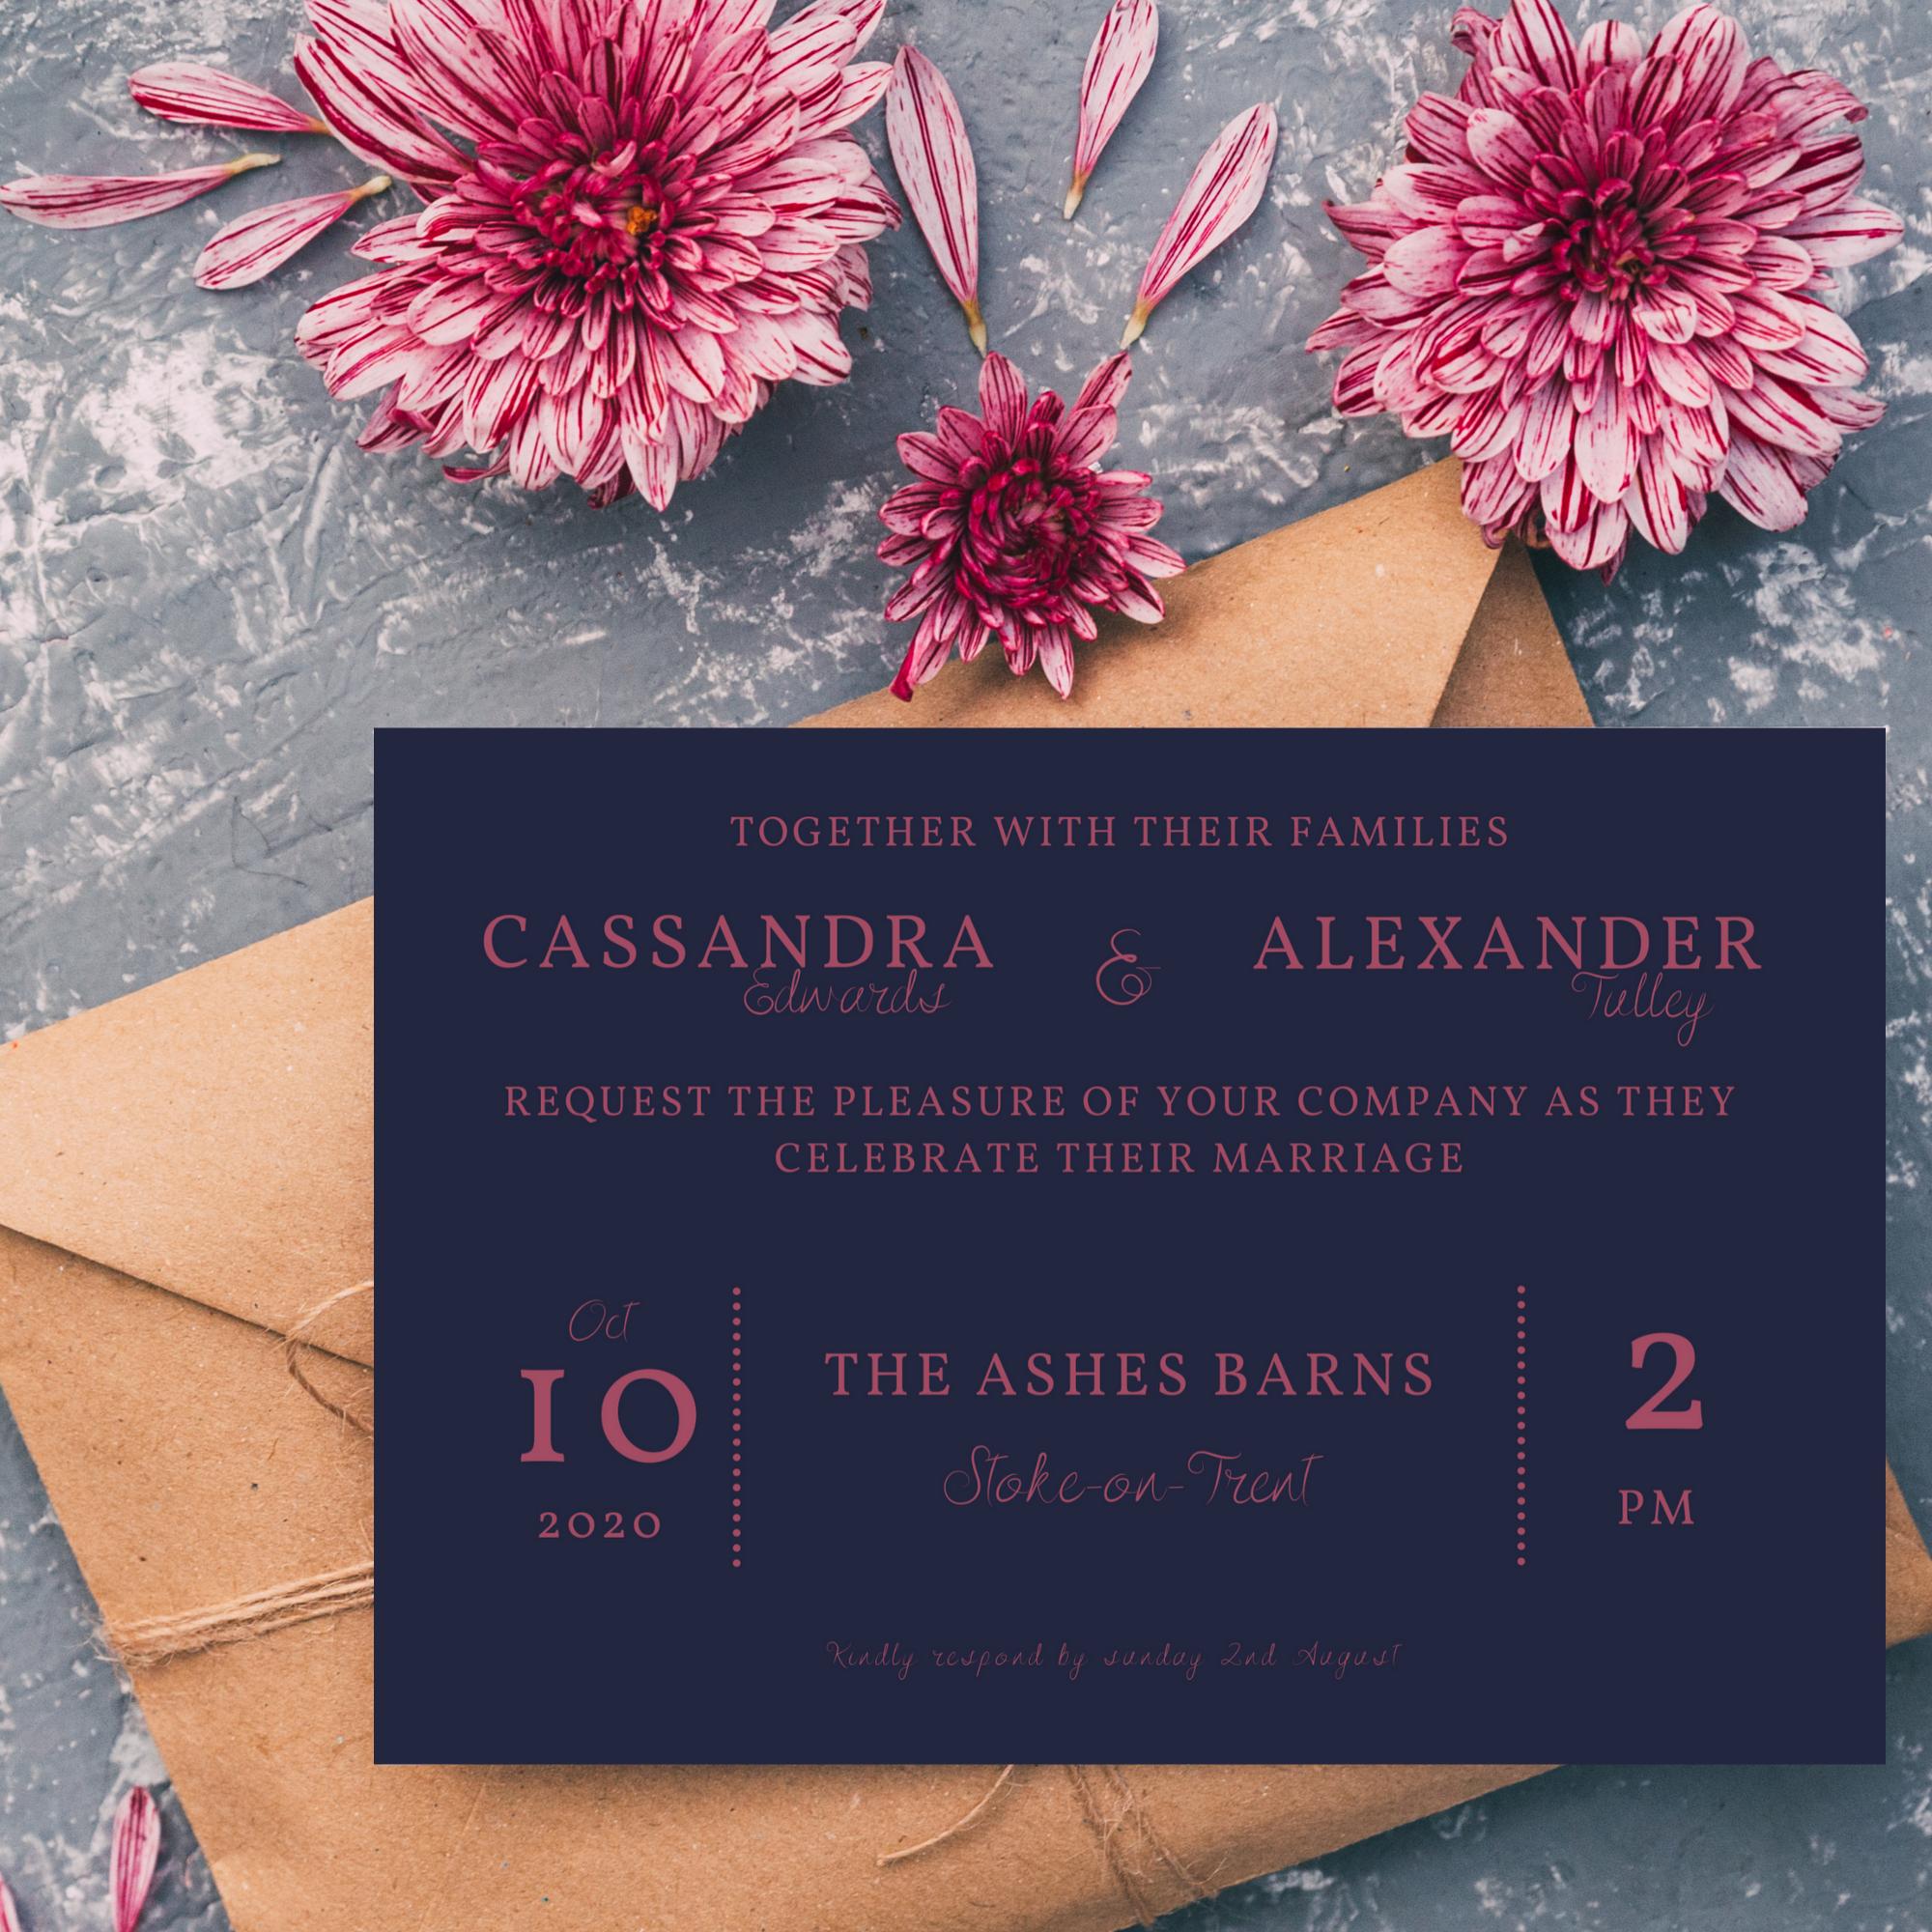 Wedding invitation in dark pink and blue